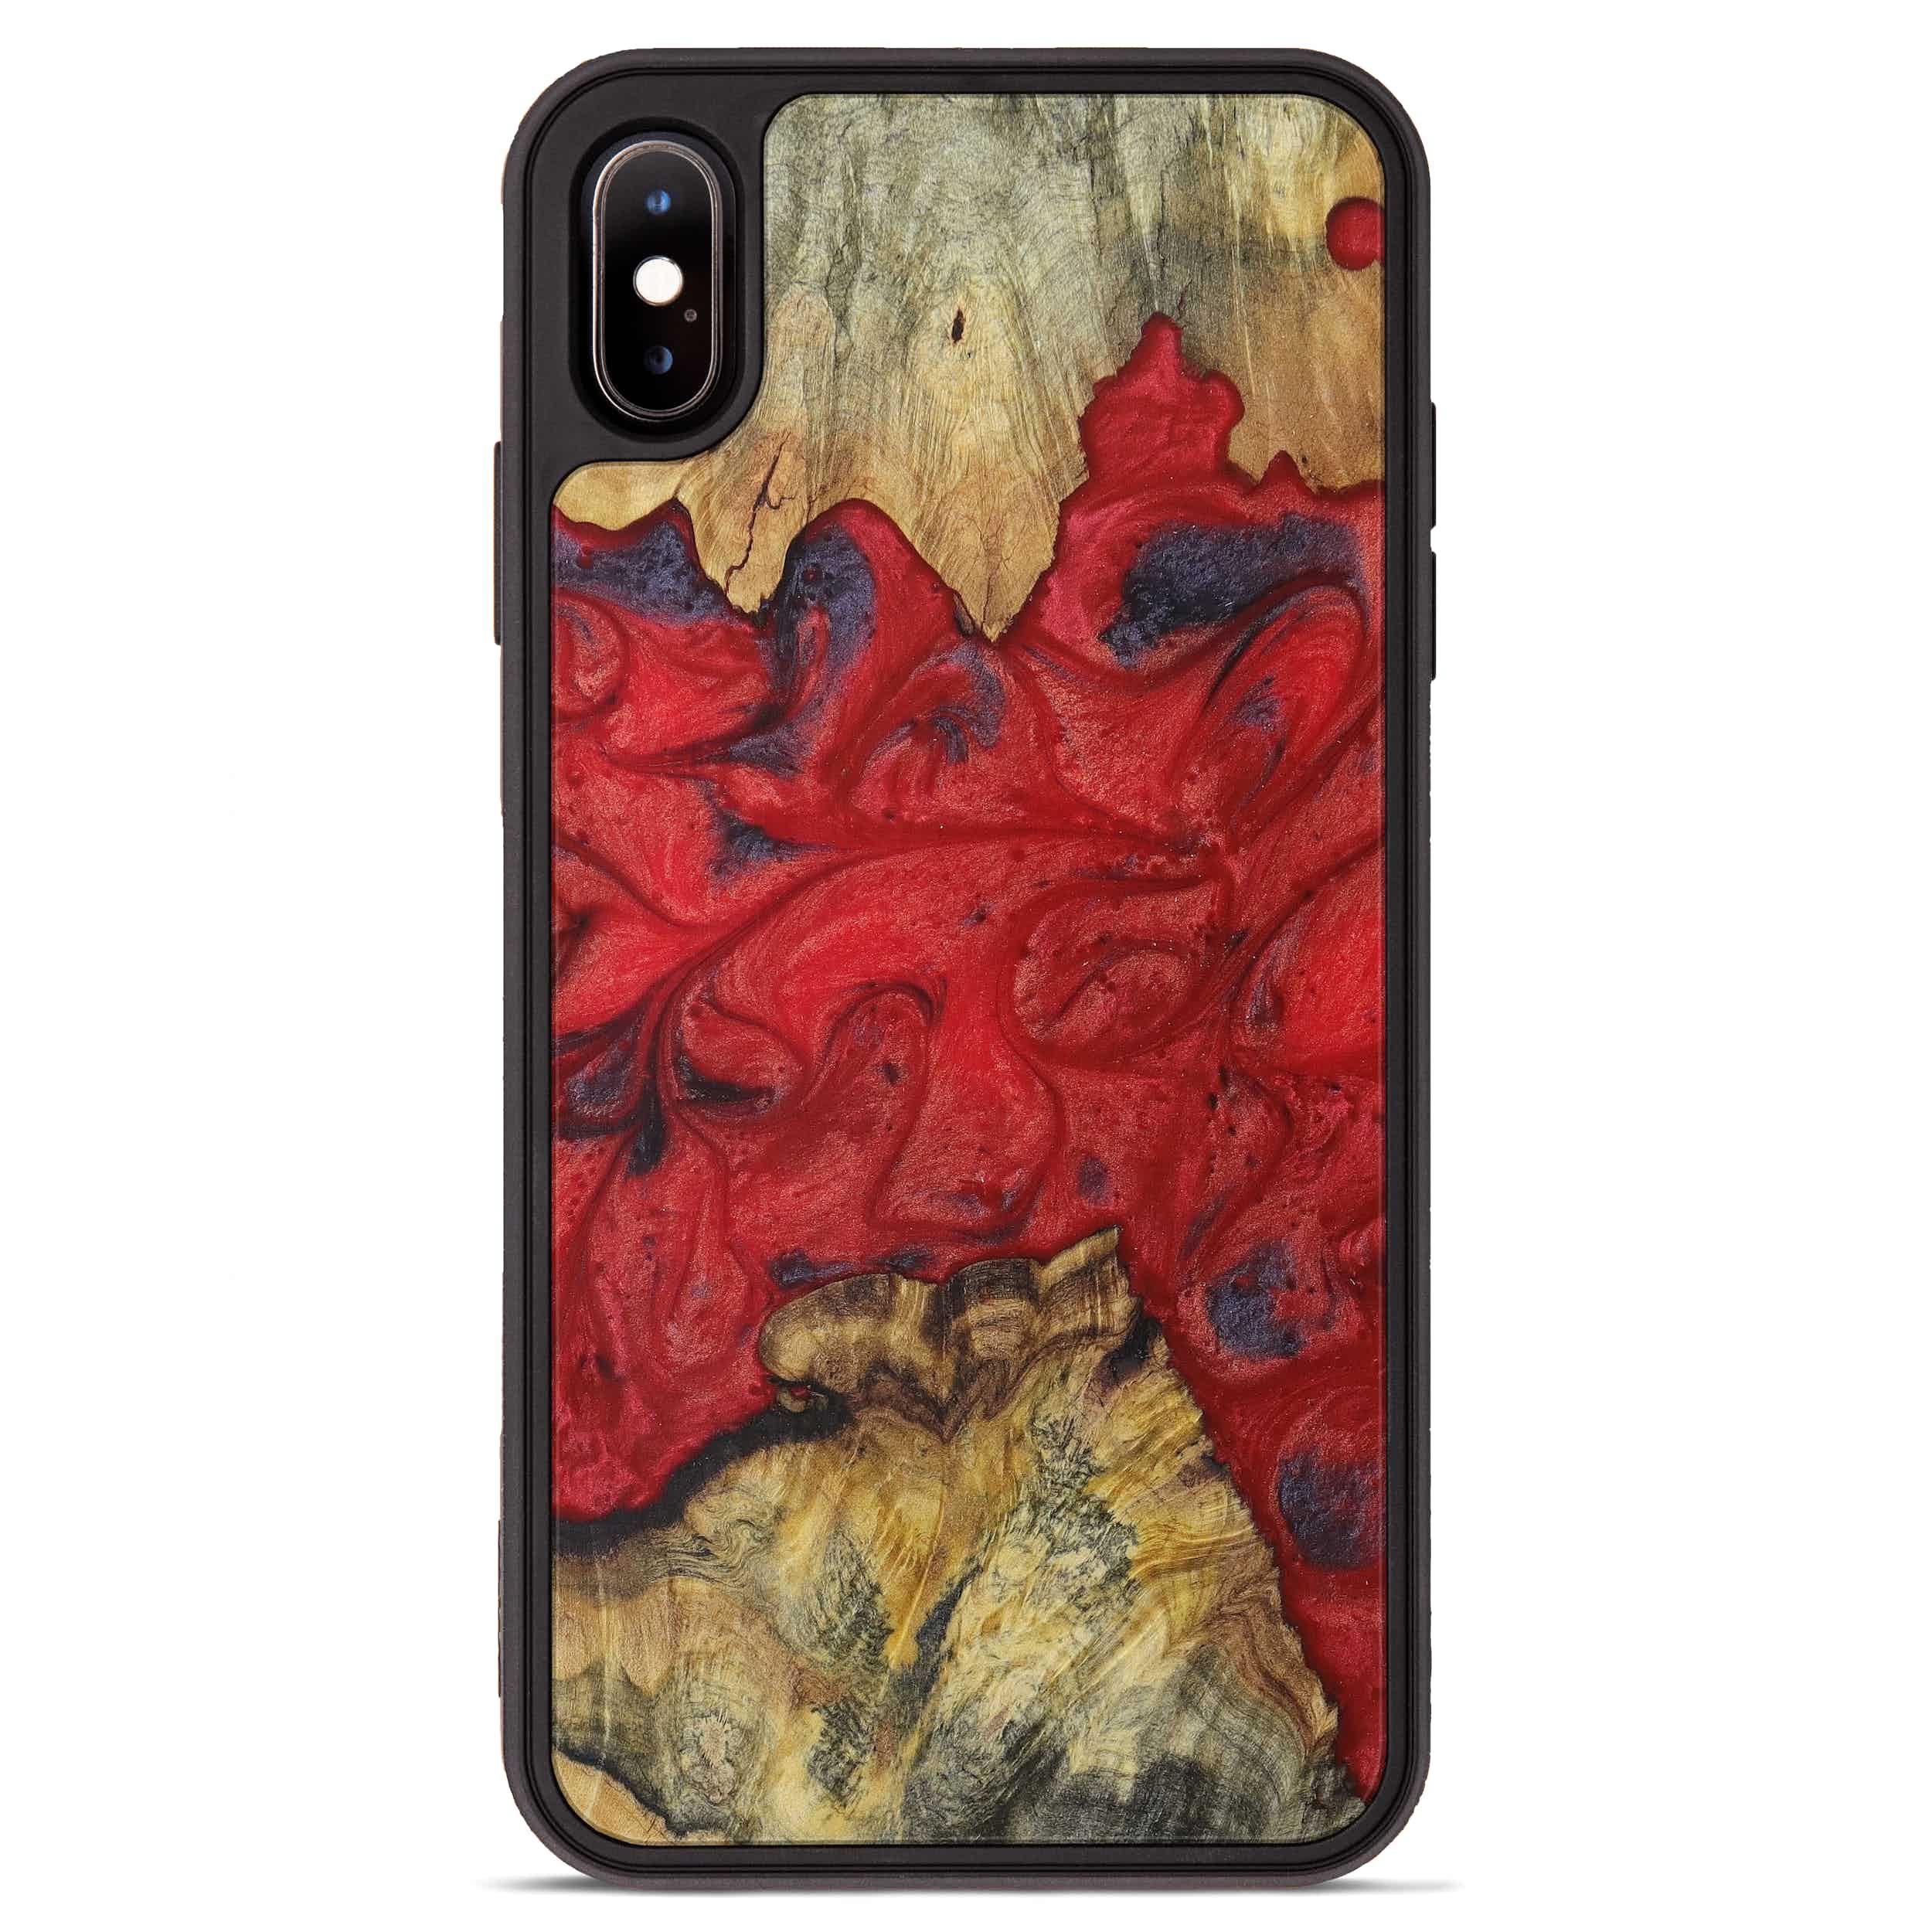 iPhone Xs Max Wood+Resin Phone Case - Vinni (Dark Red, 394297)